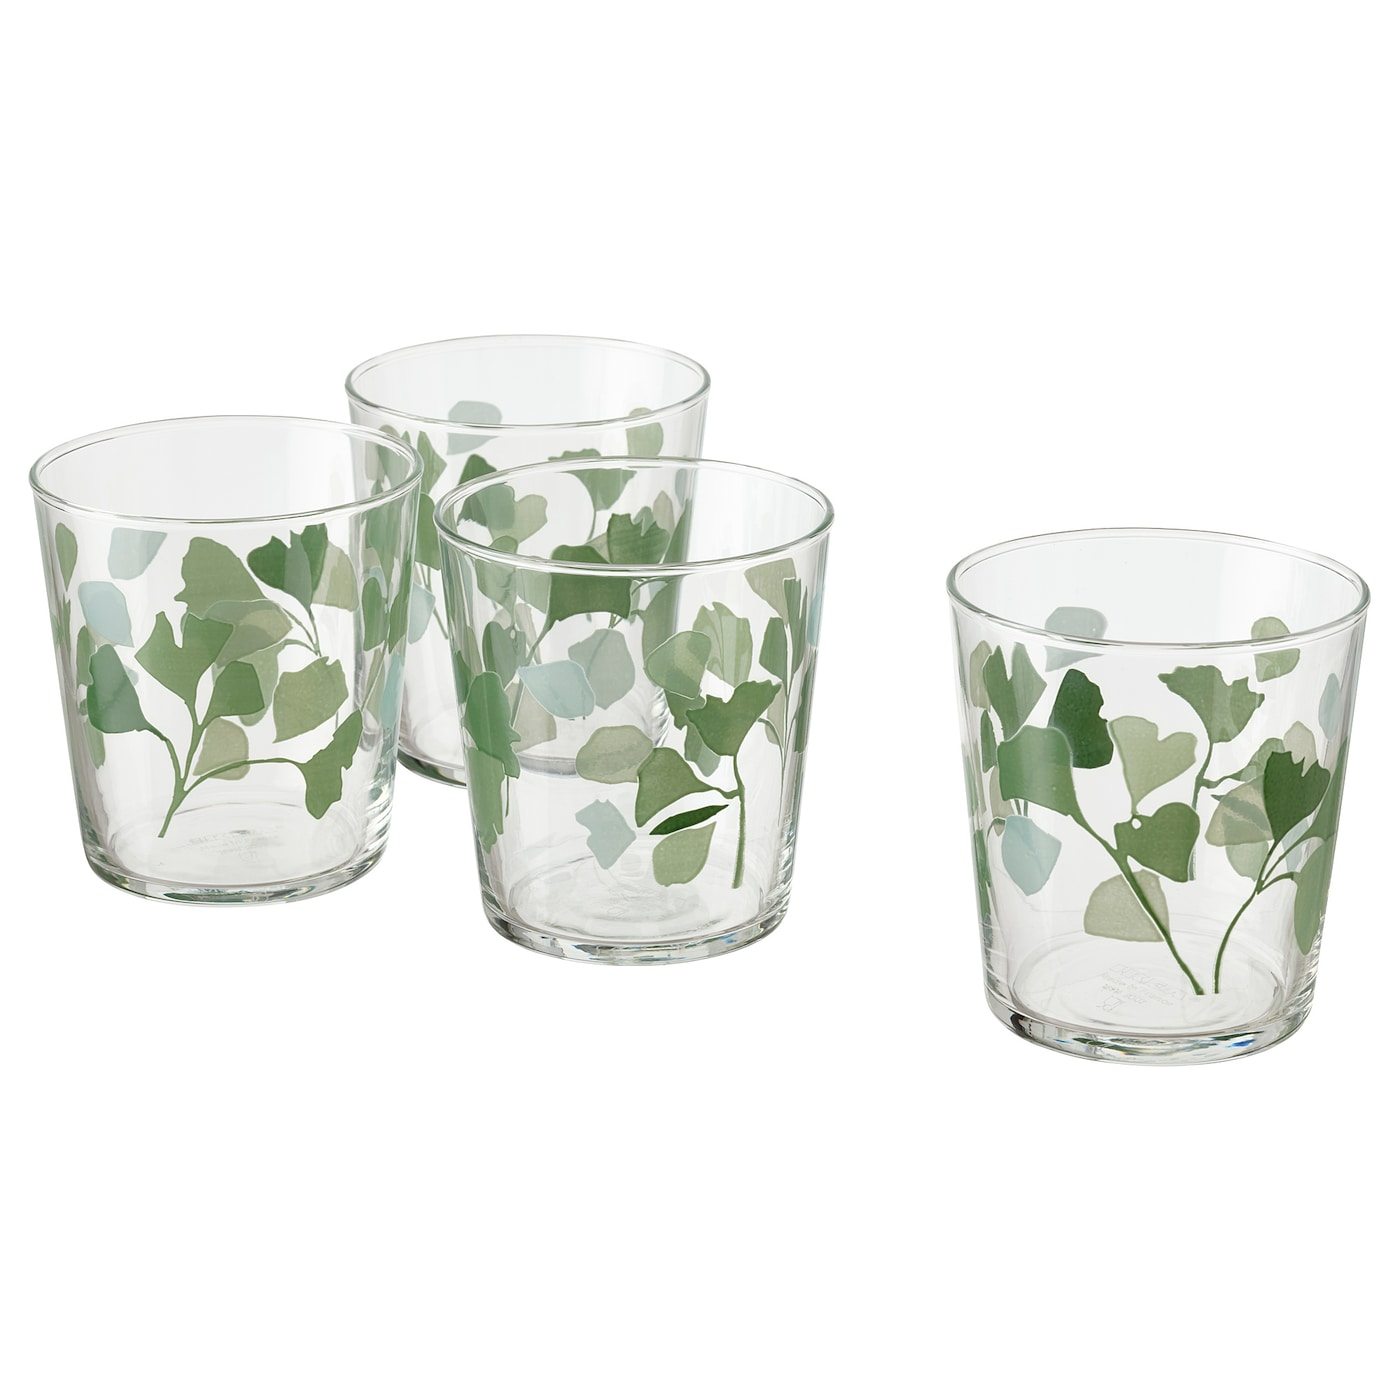 Martini glas vase ikea